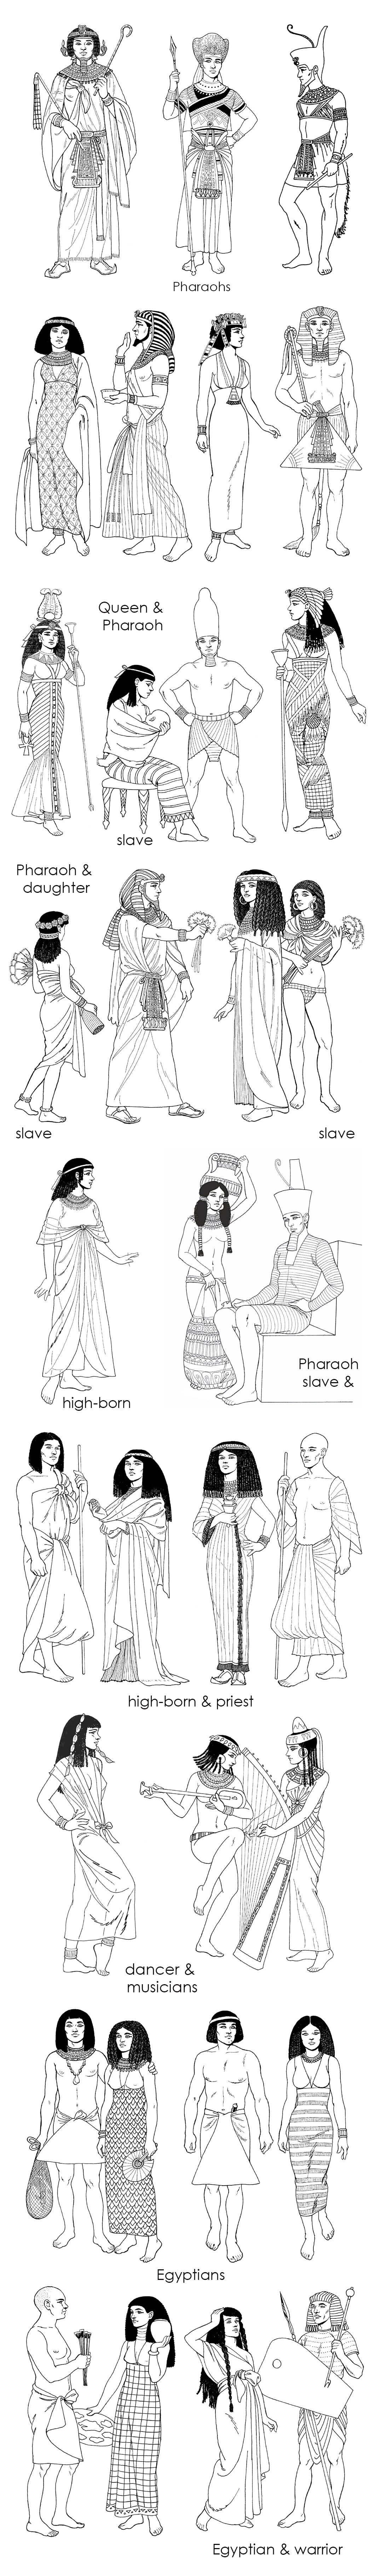 Pharaoh Queen Slave Egyptians Egypt